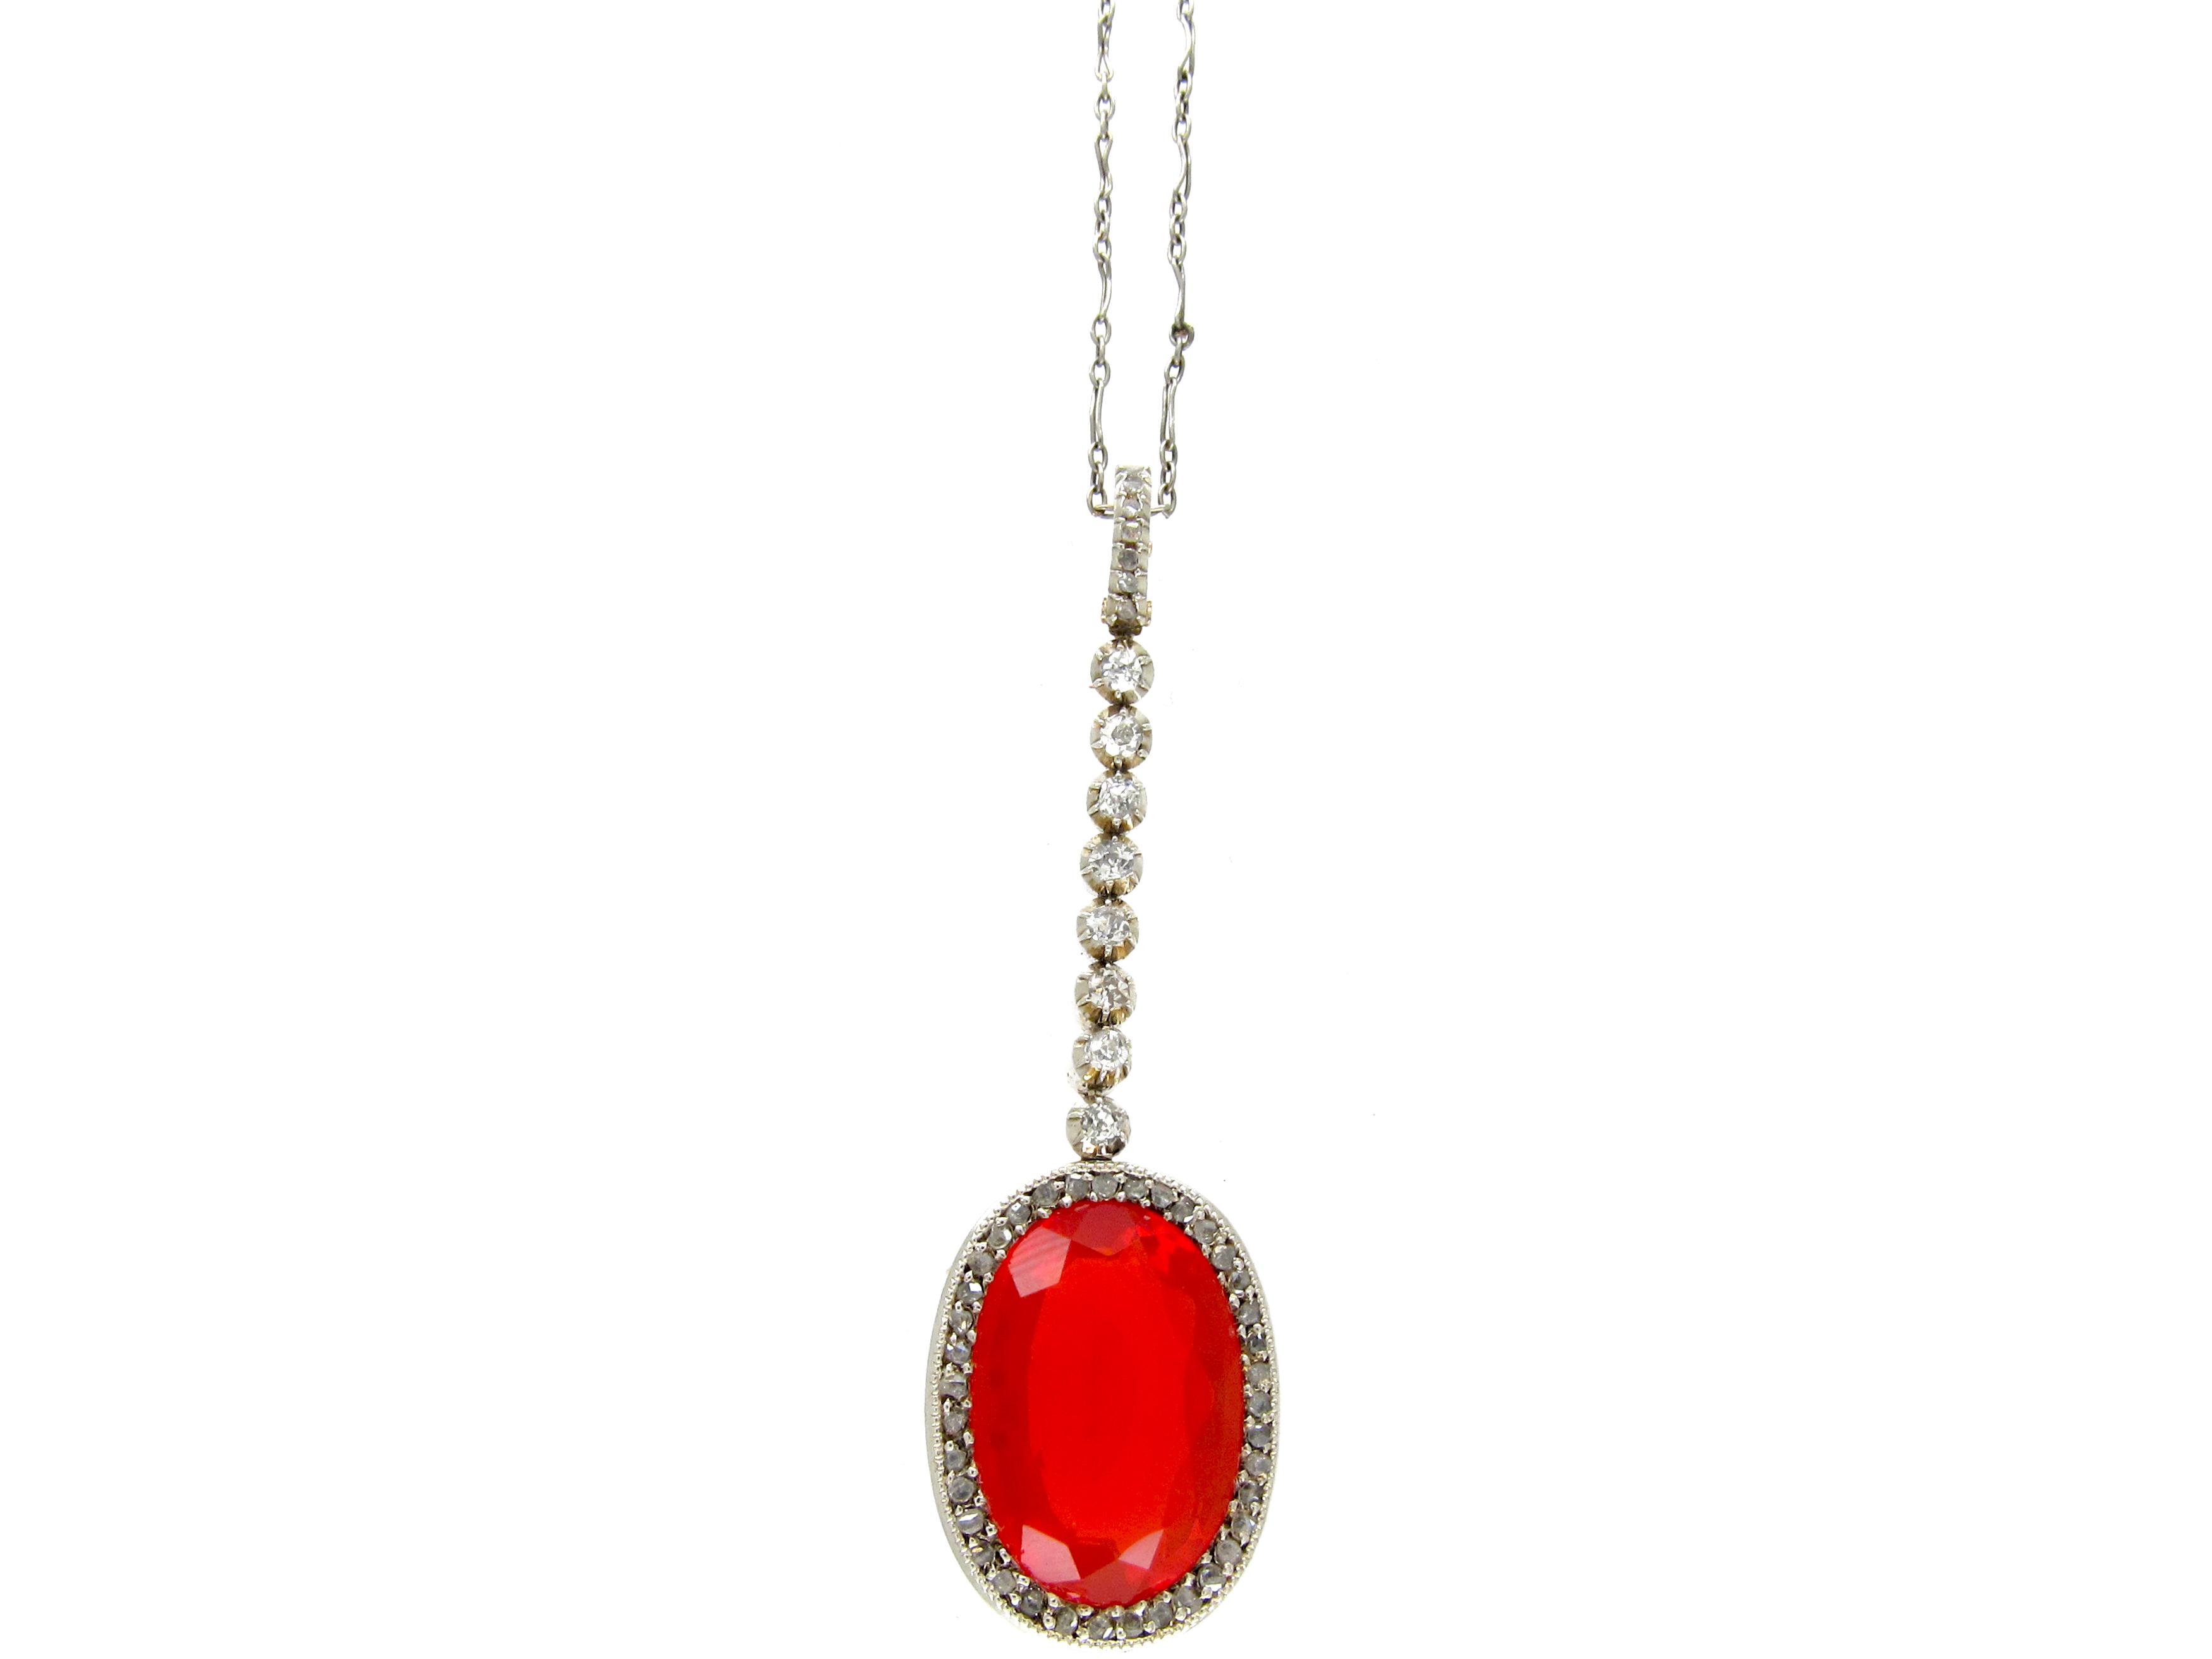 Fire Opal & Diamond Art Deco Pendant on Platinum Chain